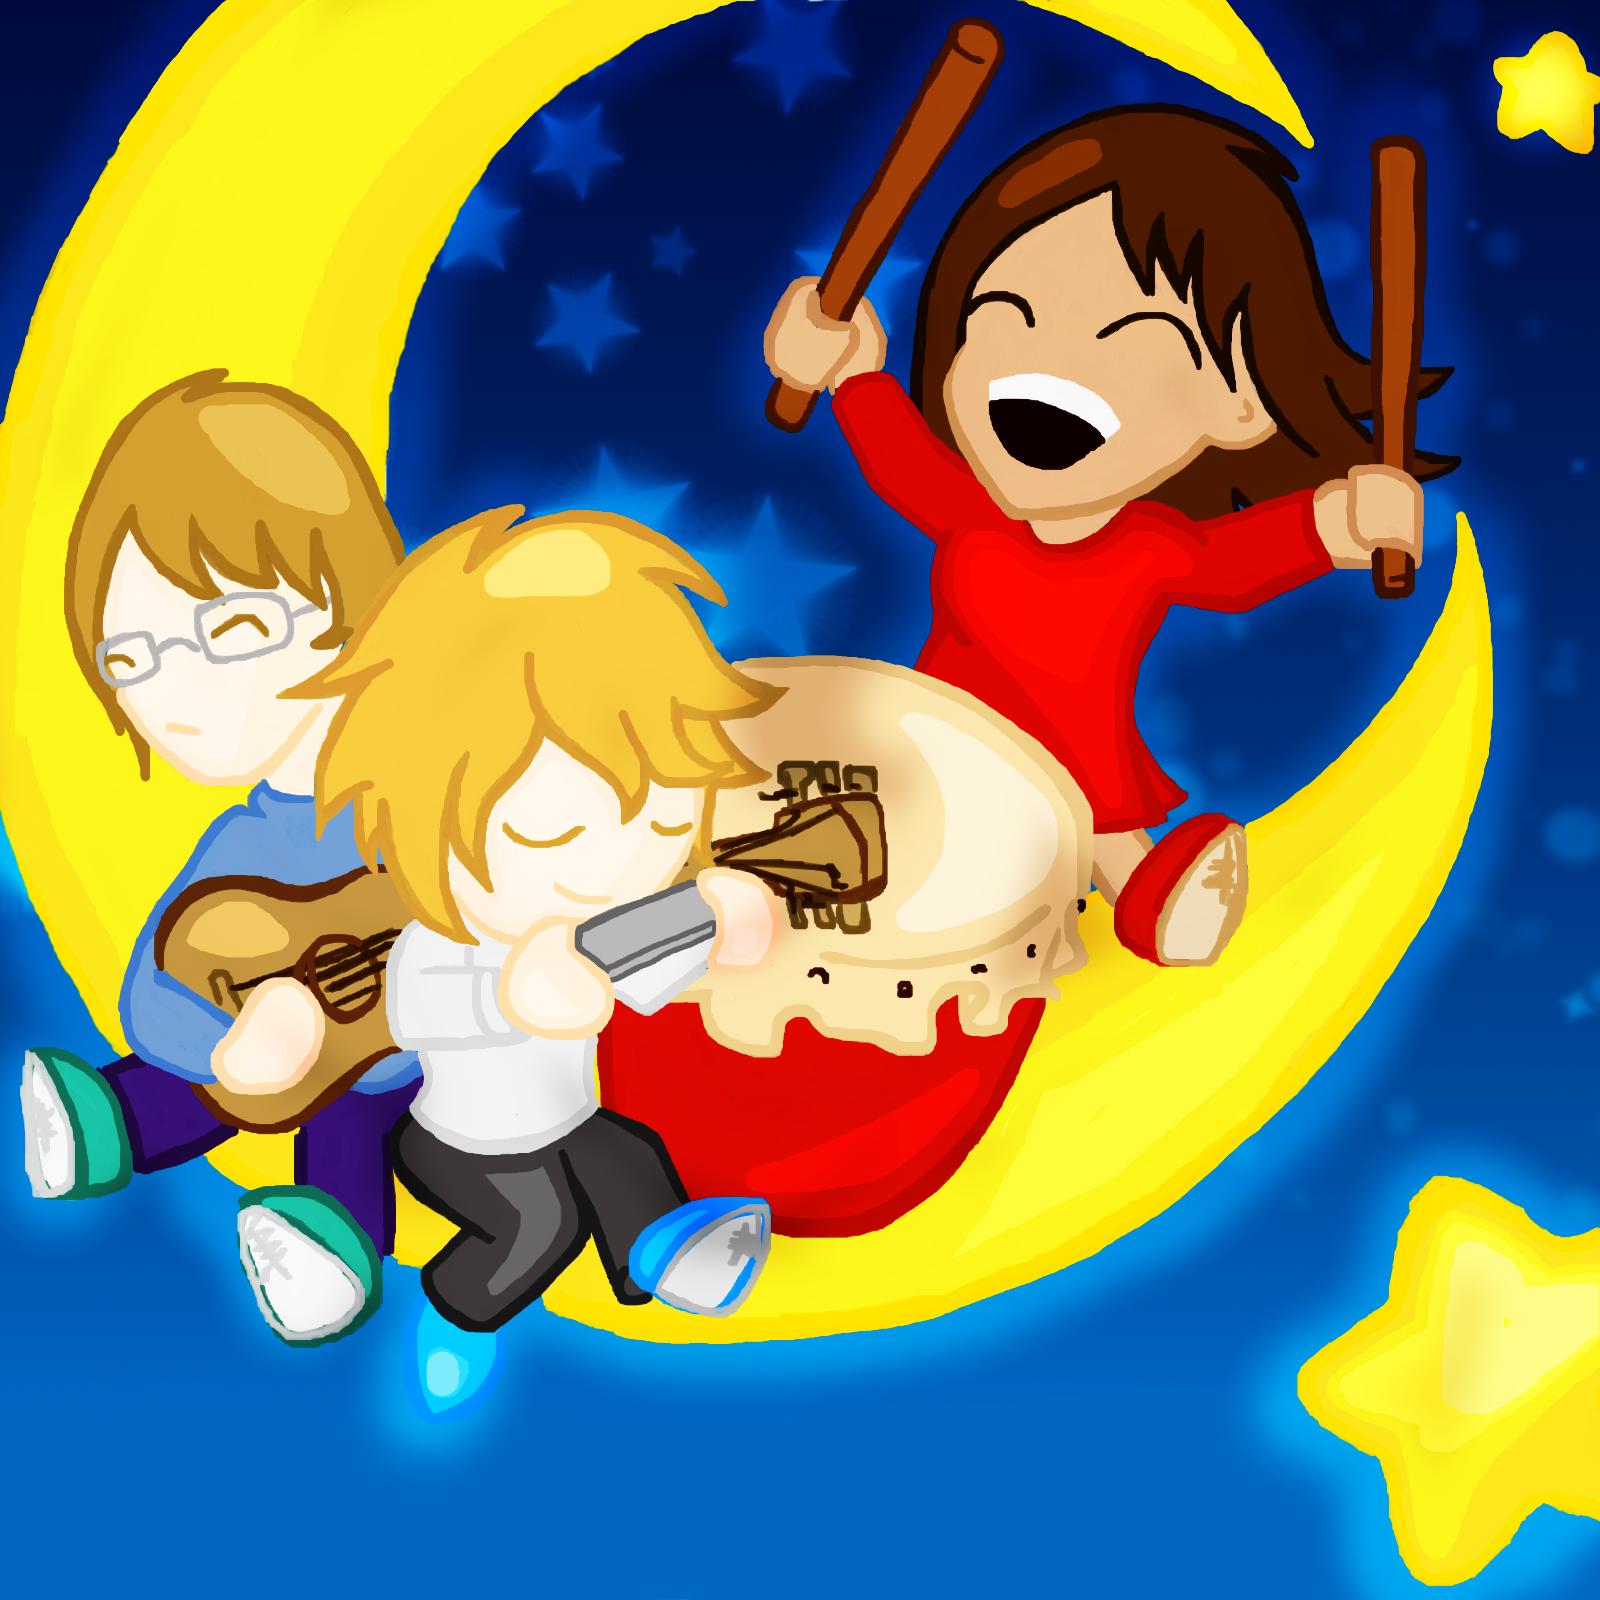 Ballade on the moon